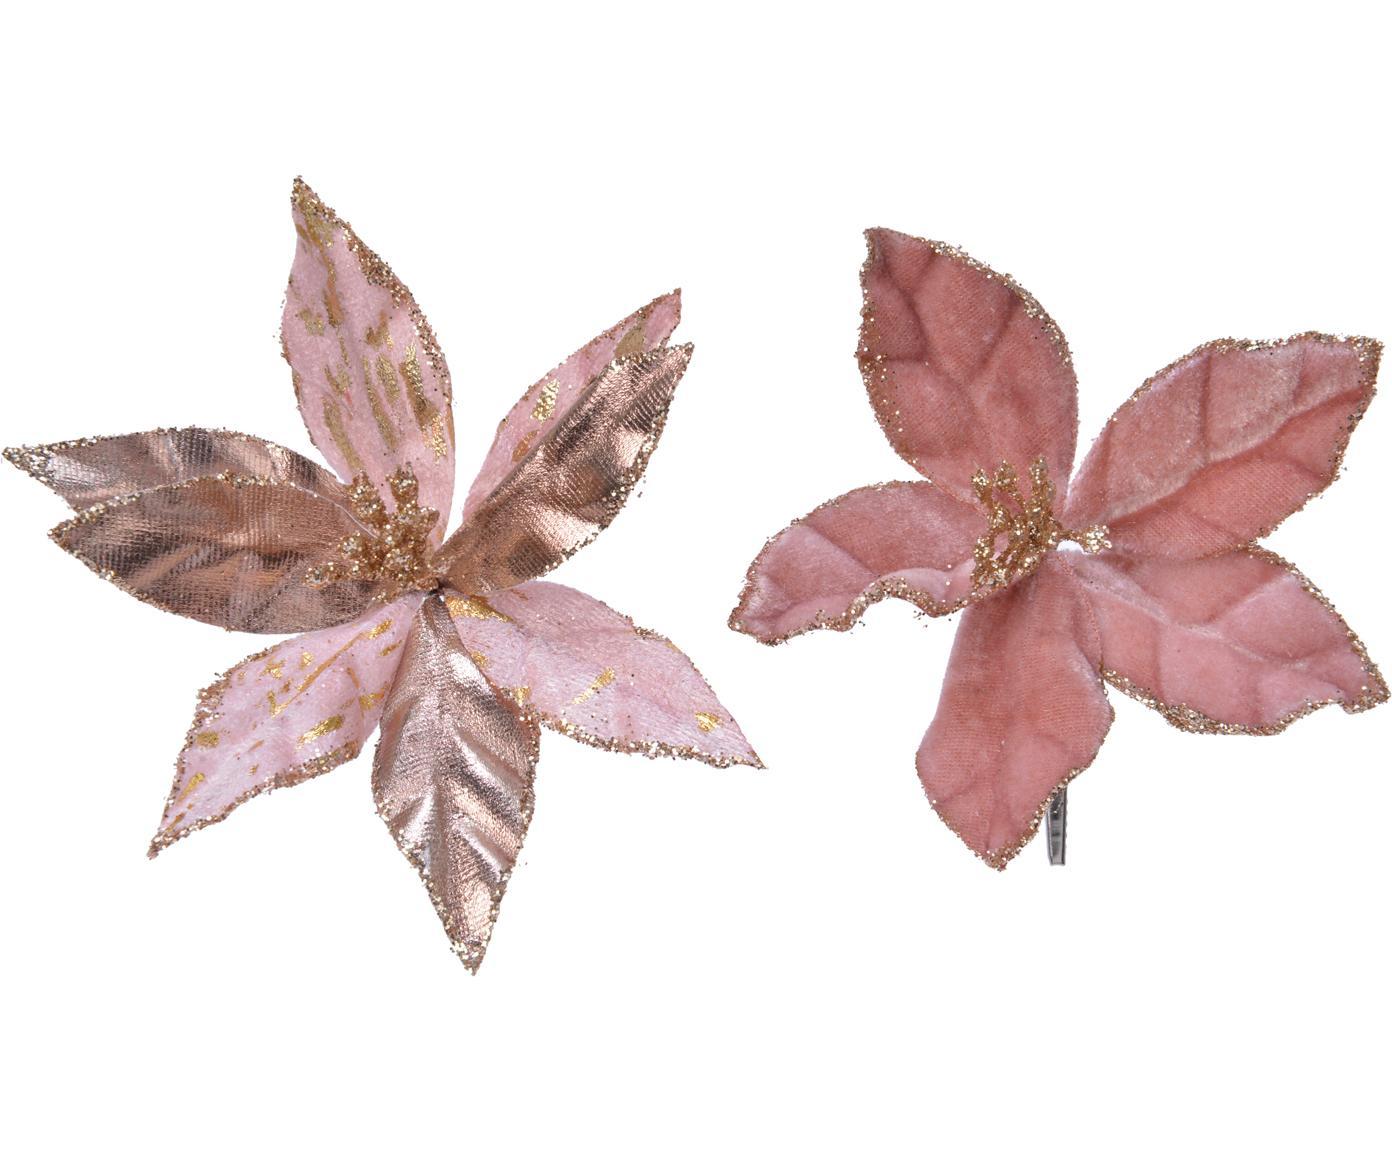 Kerstboomhangersset Blossom, 2-delig, Kunststof (PES), Rozetinten, goudkleurig, Ø 11 cm